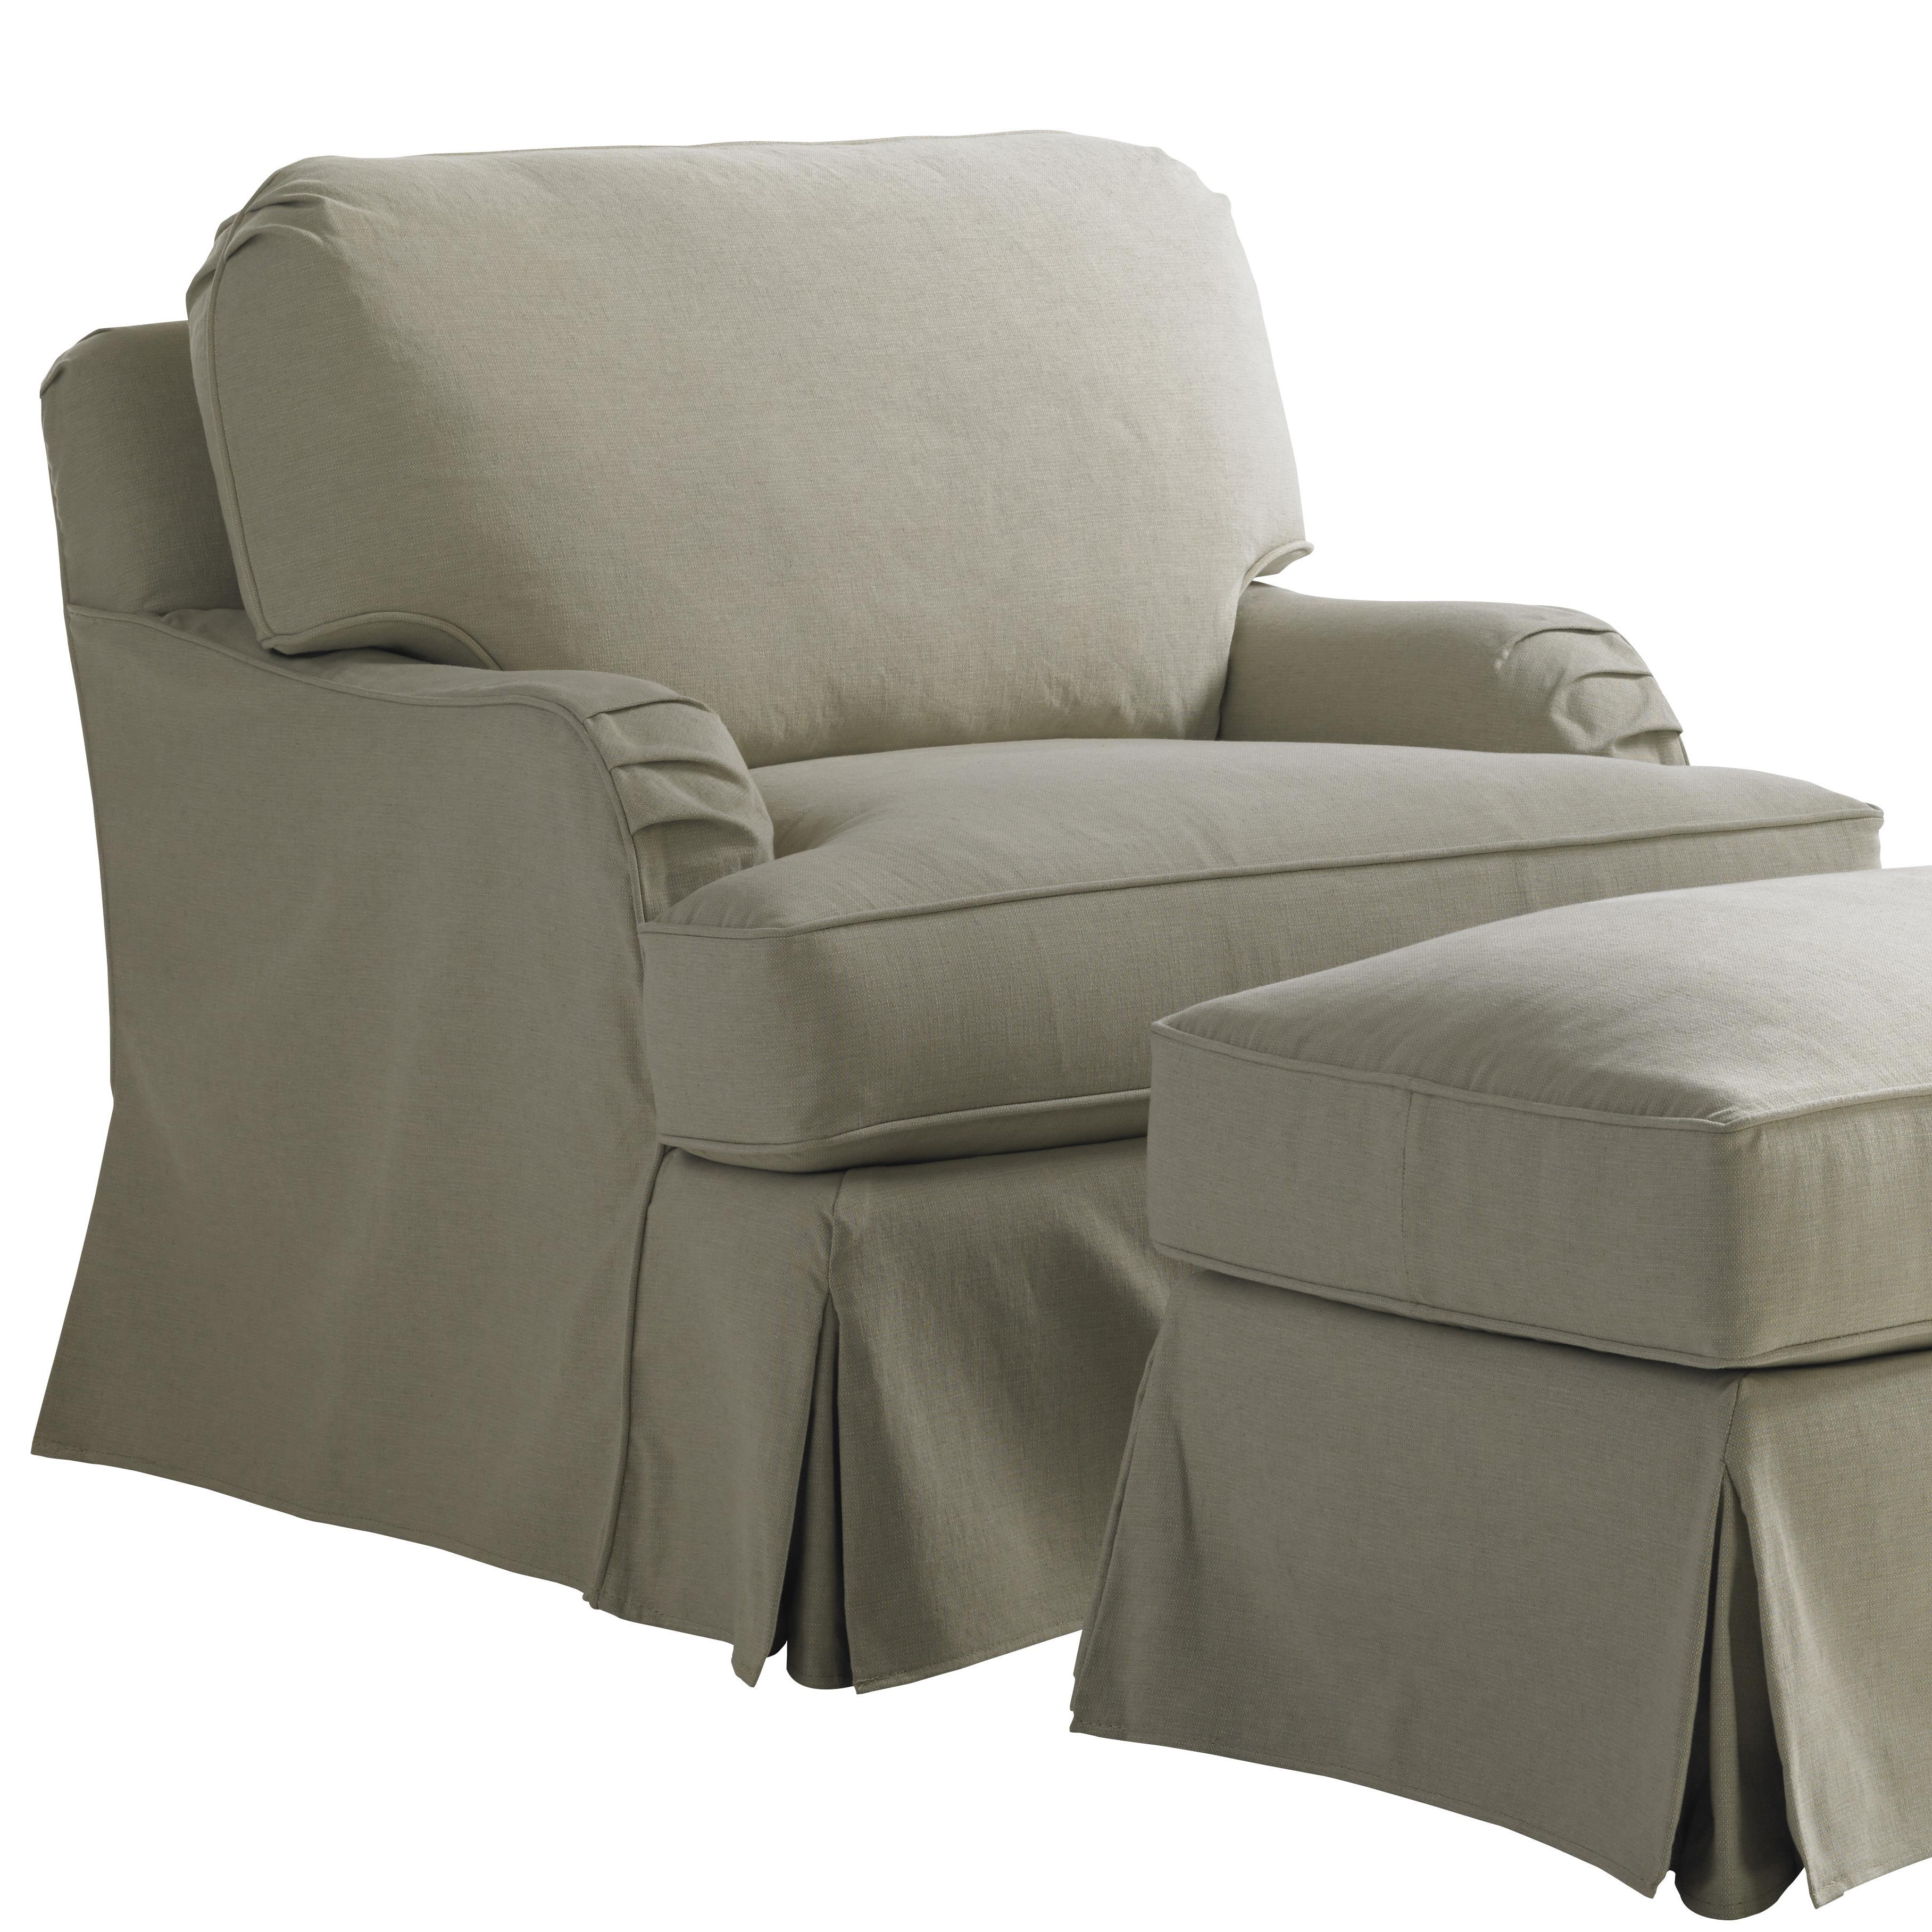 Stowe Slipcover Chair